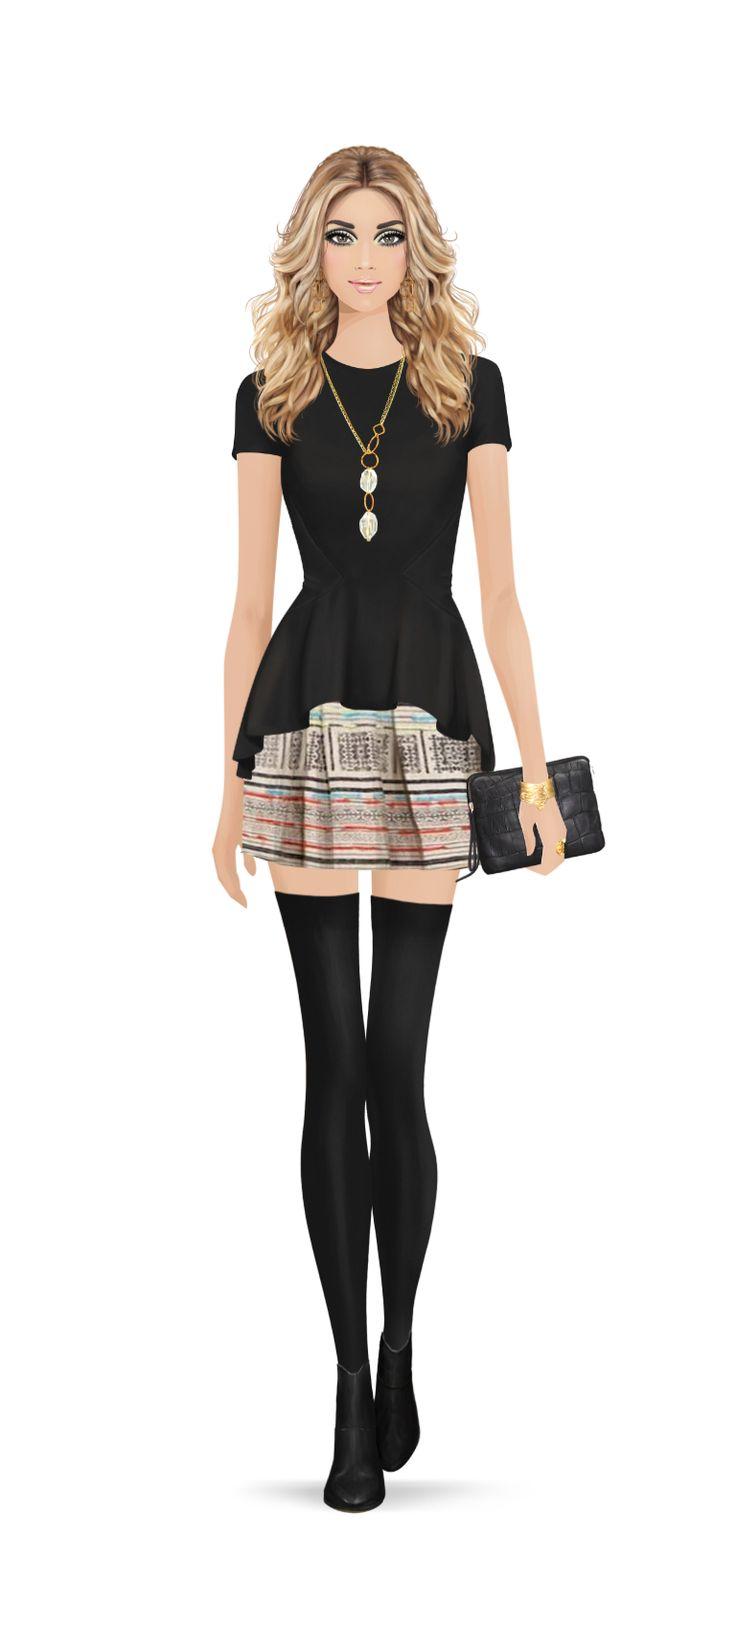 Fashion Game (something I would wear)